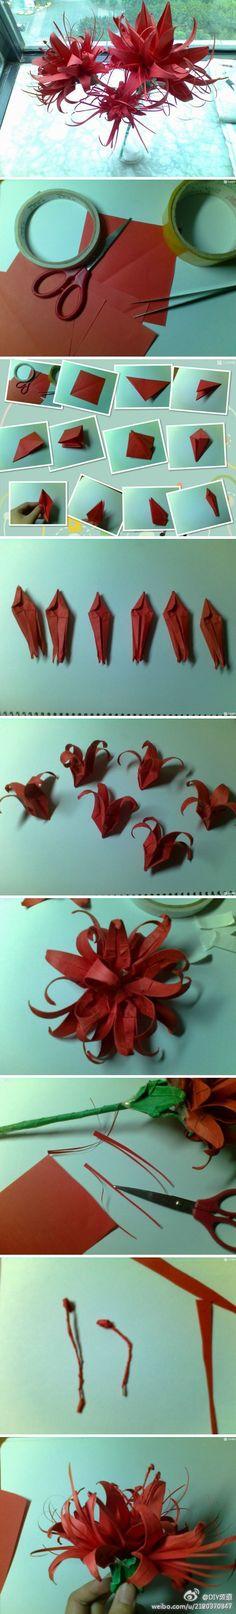 Origami flower basket crafts pinterest origami flowers origami flowers flowers diy crafts home made easy crafts craft idea crafts ideas diy ideas diy crafts diy idea do it yourself christmas crafts solutioingenieria Gallery